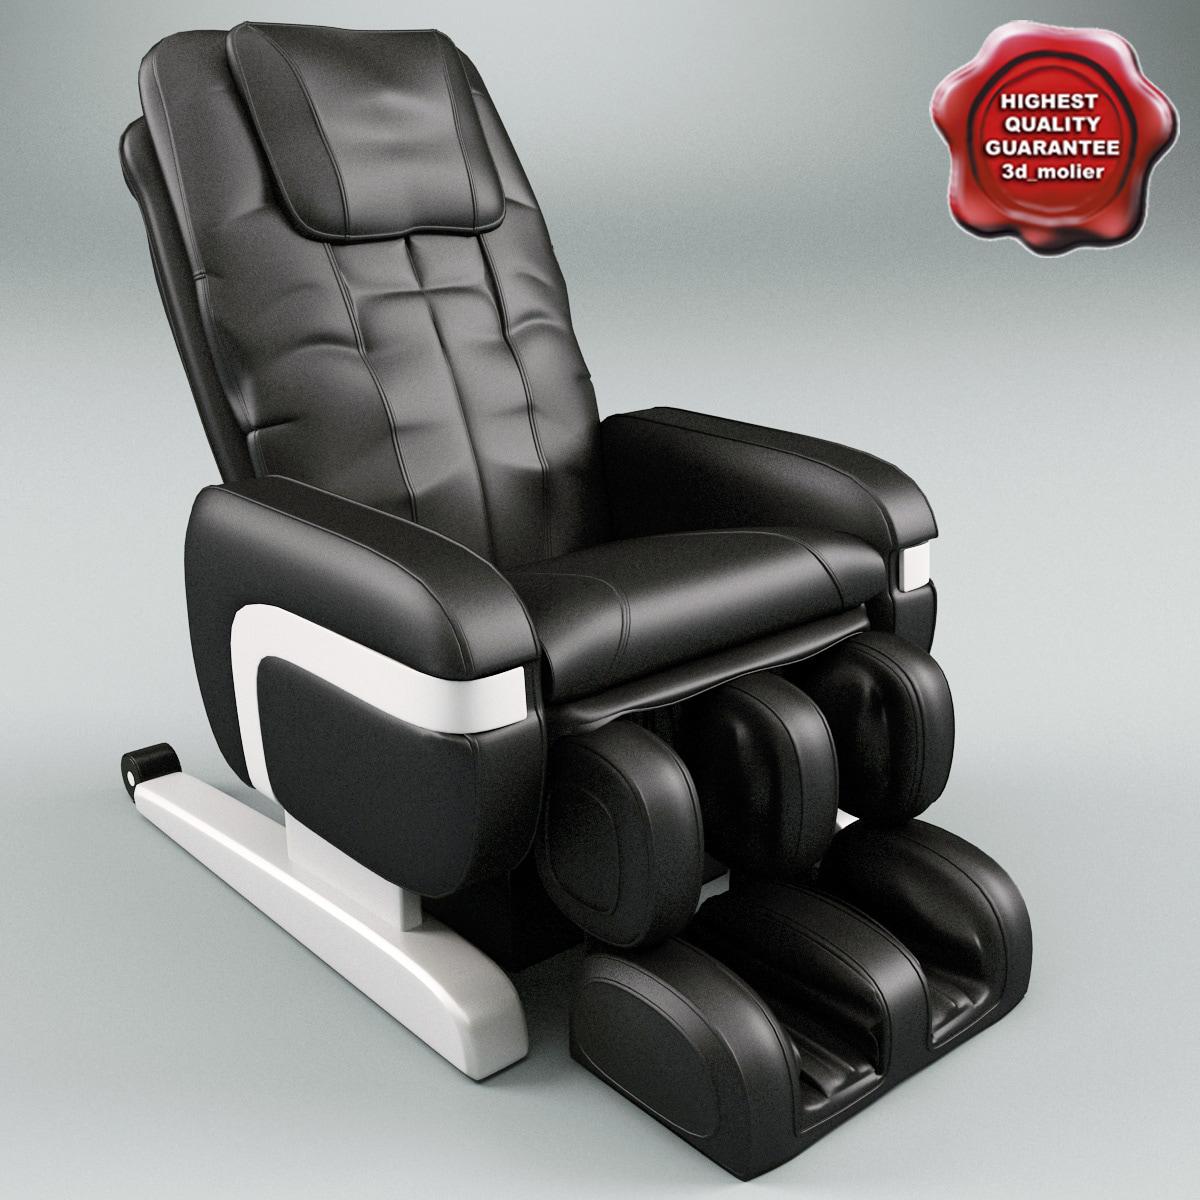 3d massage chair bf-136 model